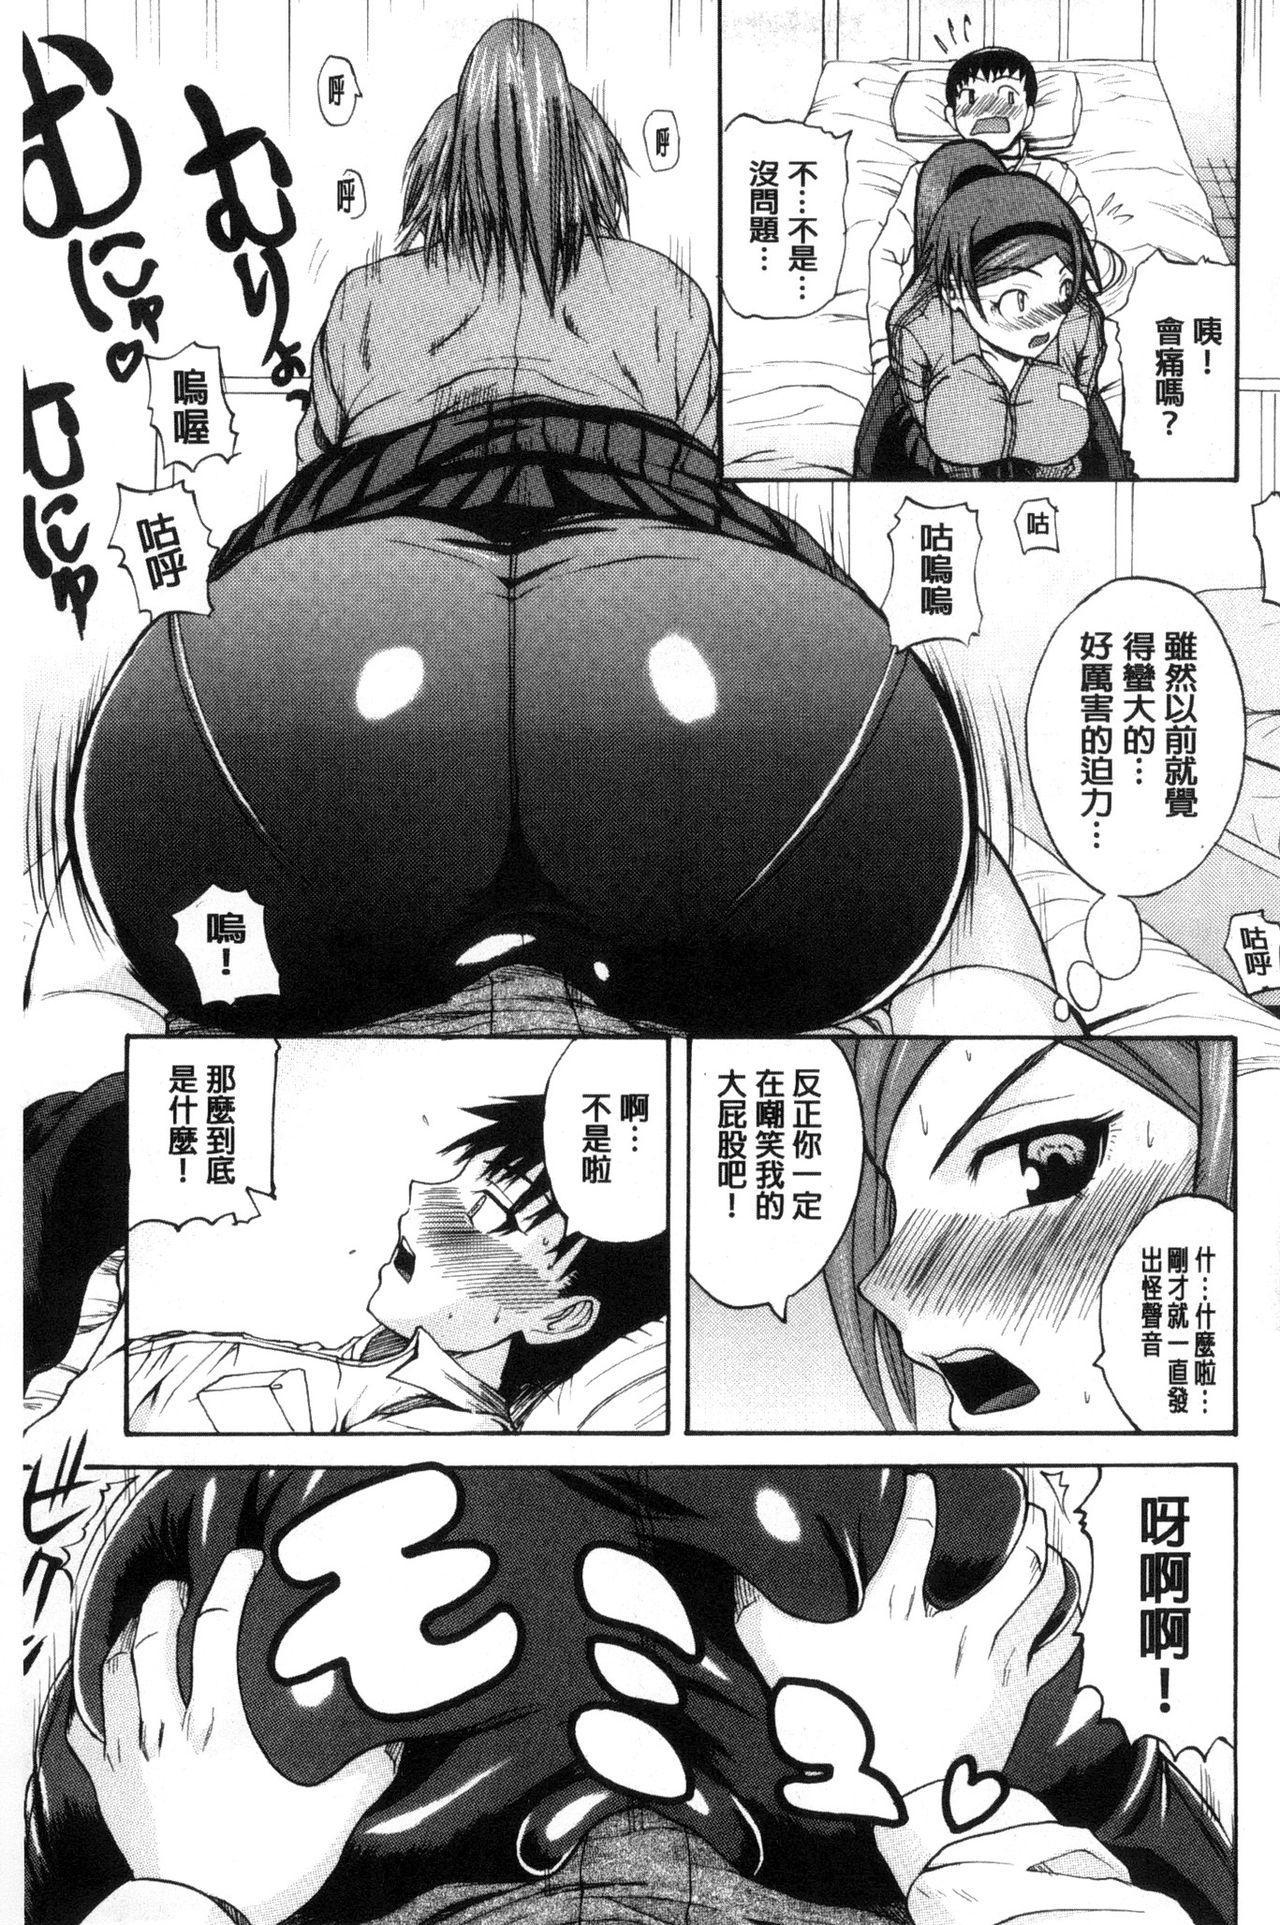 Opink Health Seibo no Fukuin 195